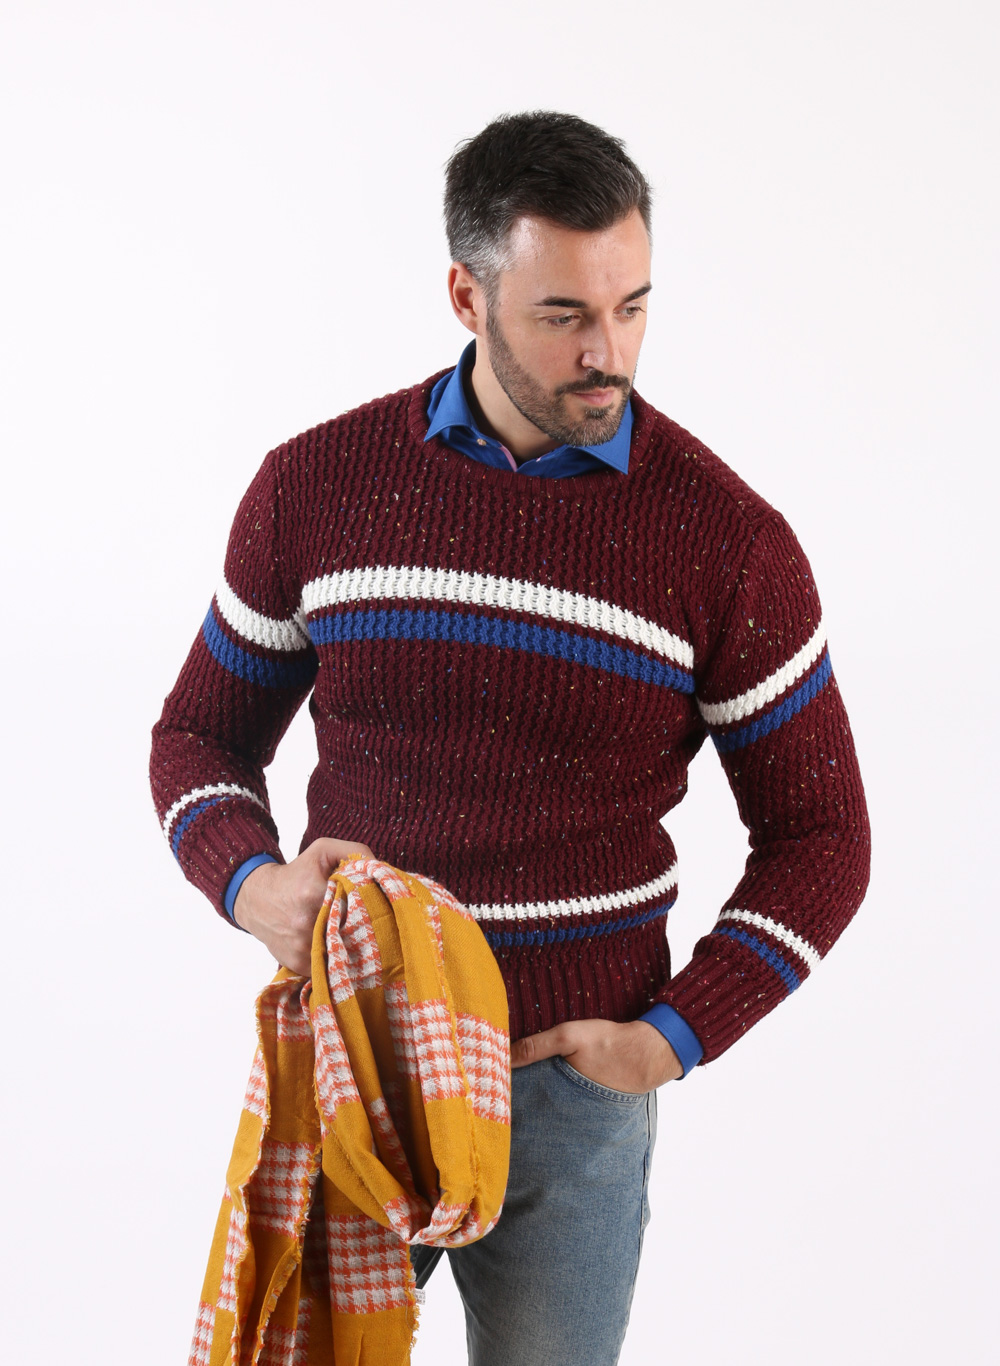 pulovere-tricotate-elegante-pentru-barbati-ieftine